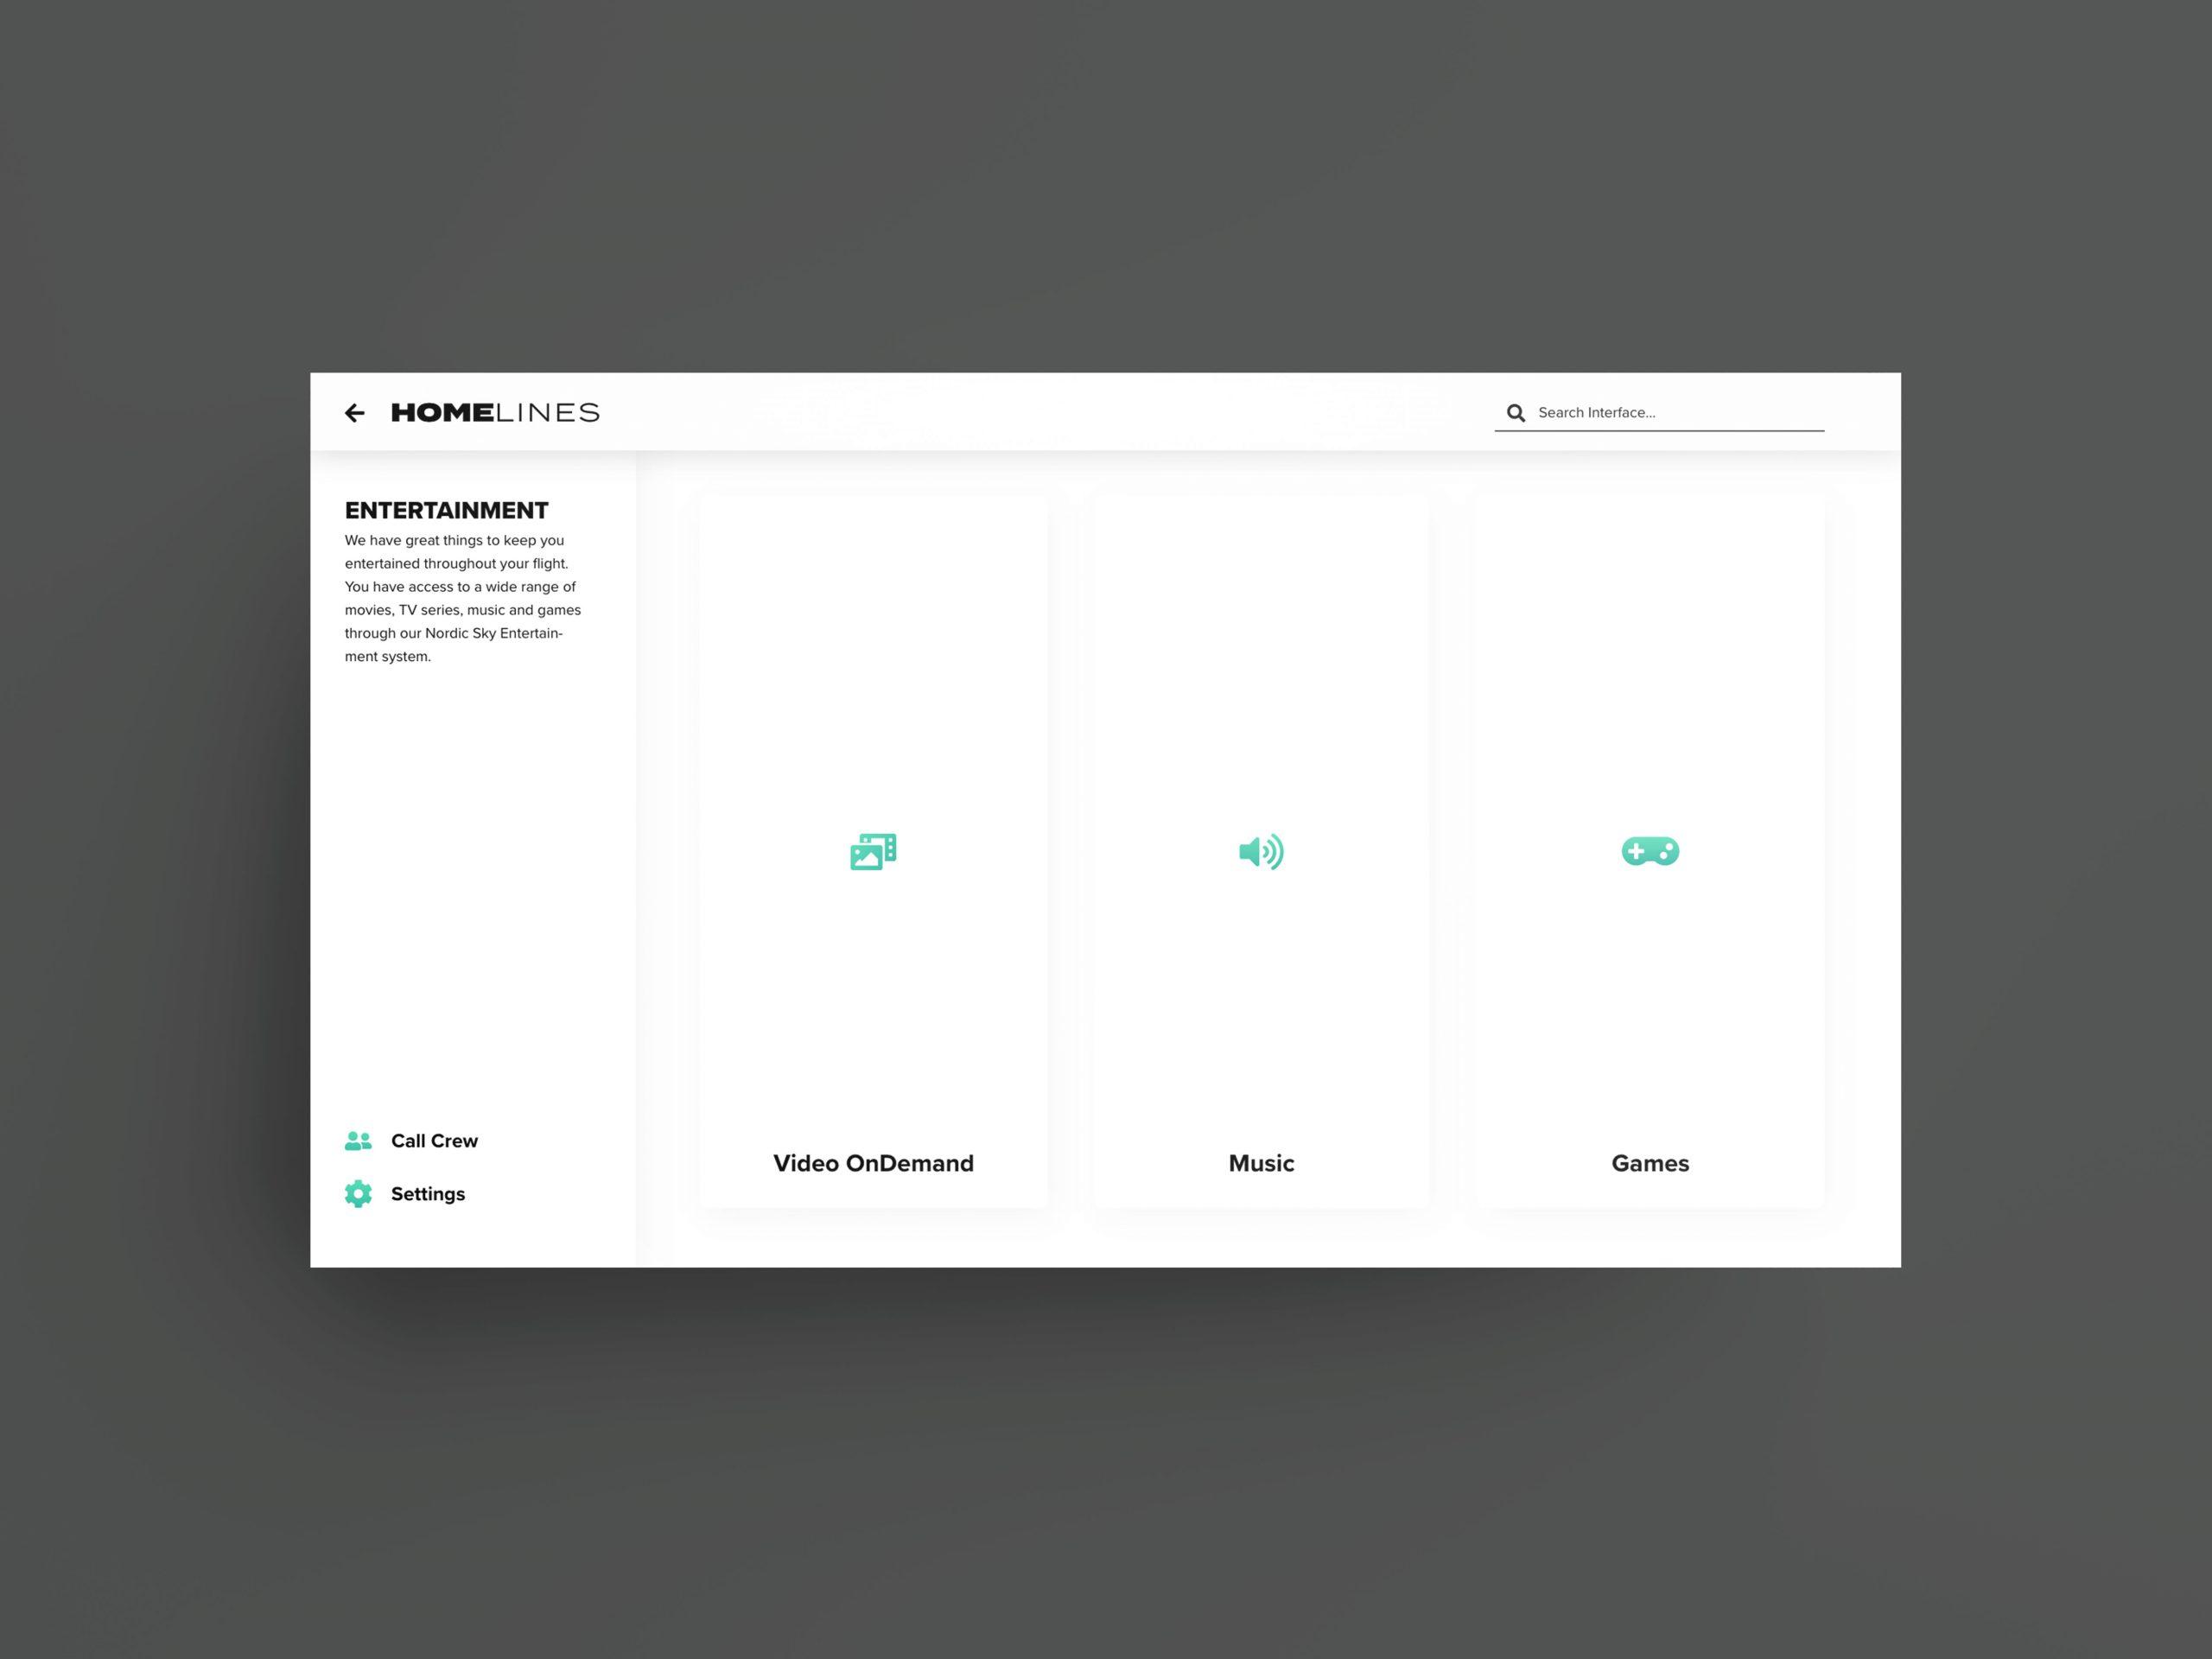 screens-mockup-neu-04